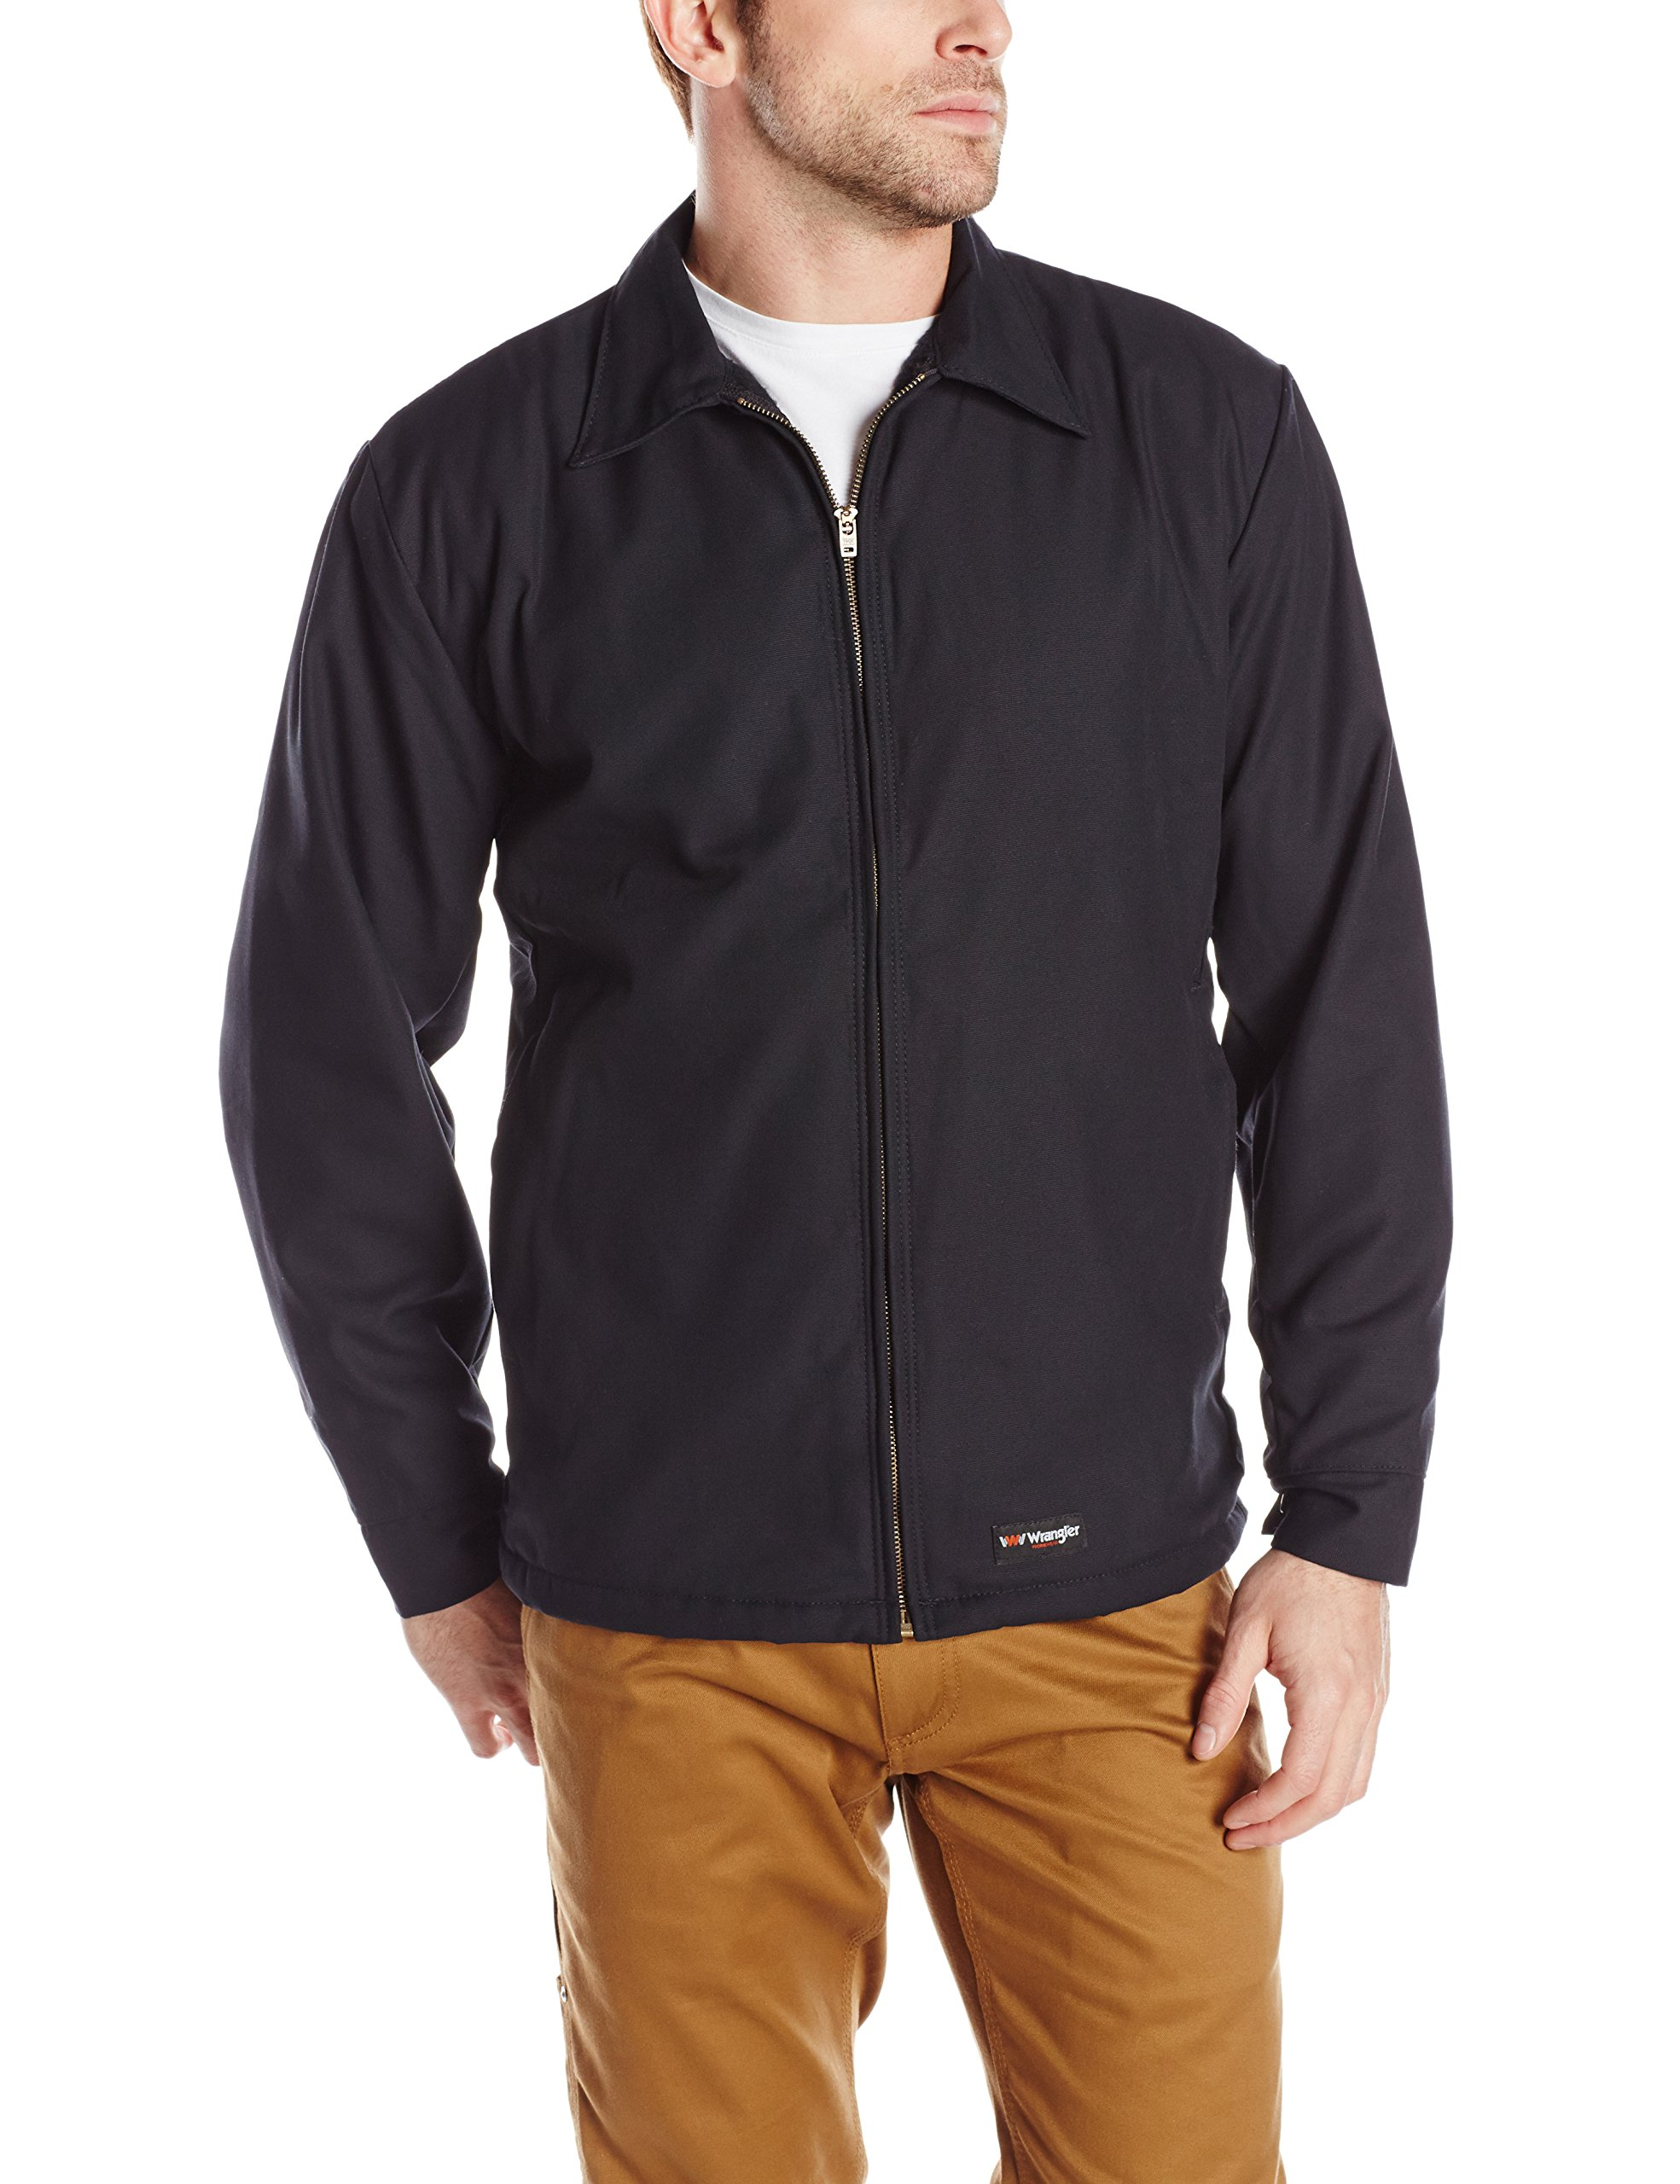 Wrangler Workwear Men's Work Jacket, Black, Medium